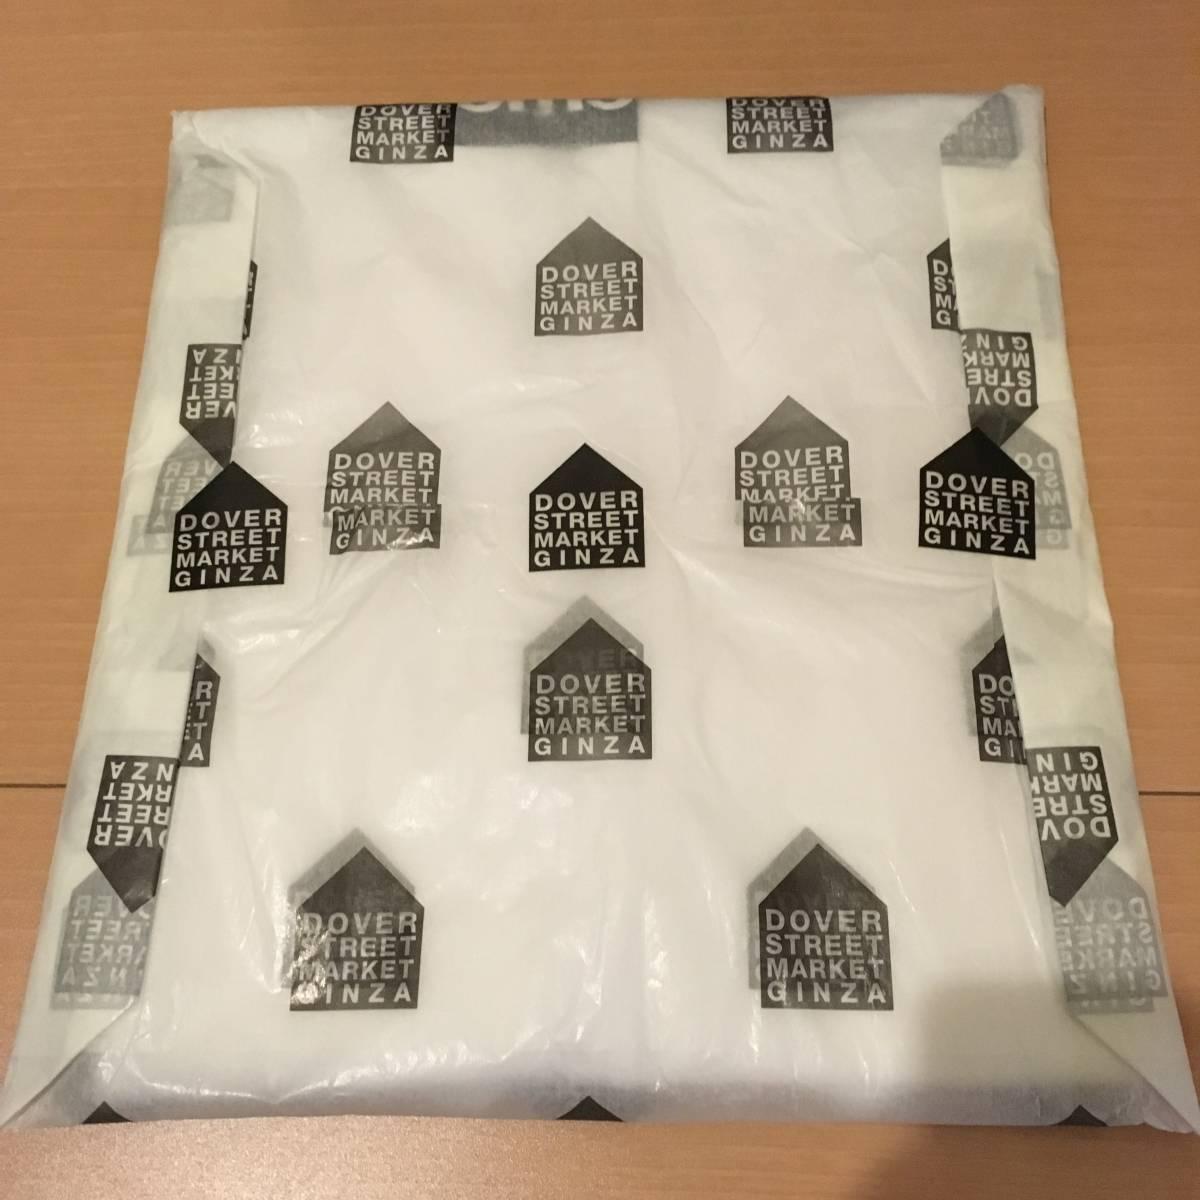 DSMG購入 確実正規品 Supreme Comme des Garcons SHIRT Split Box Logo Tee White S 白 シュプリーム コムデギャルソン Tシャツ 新品_画像5